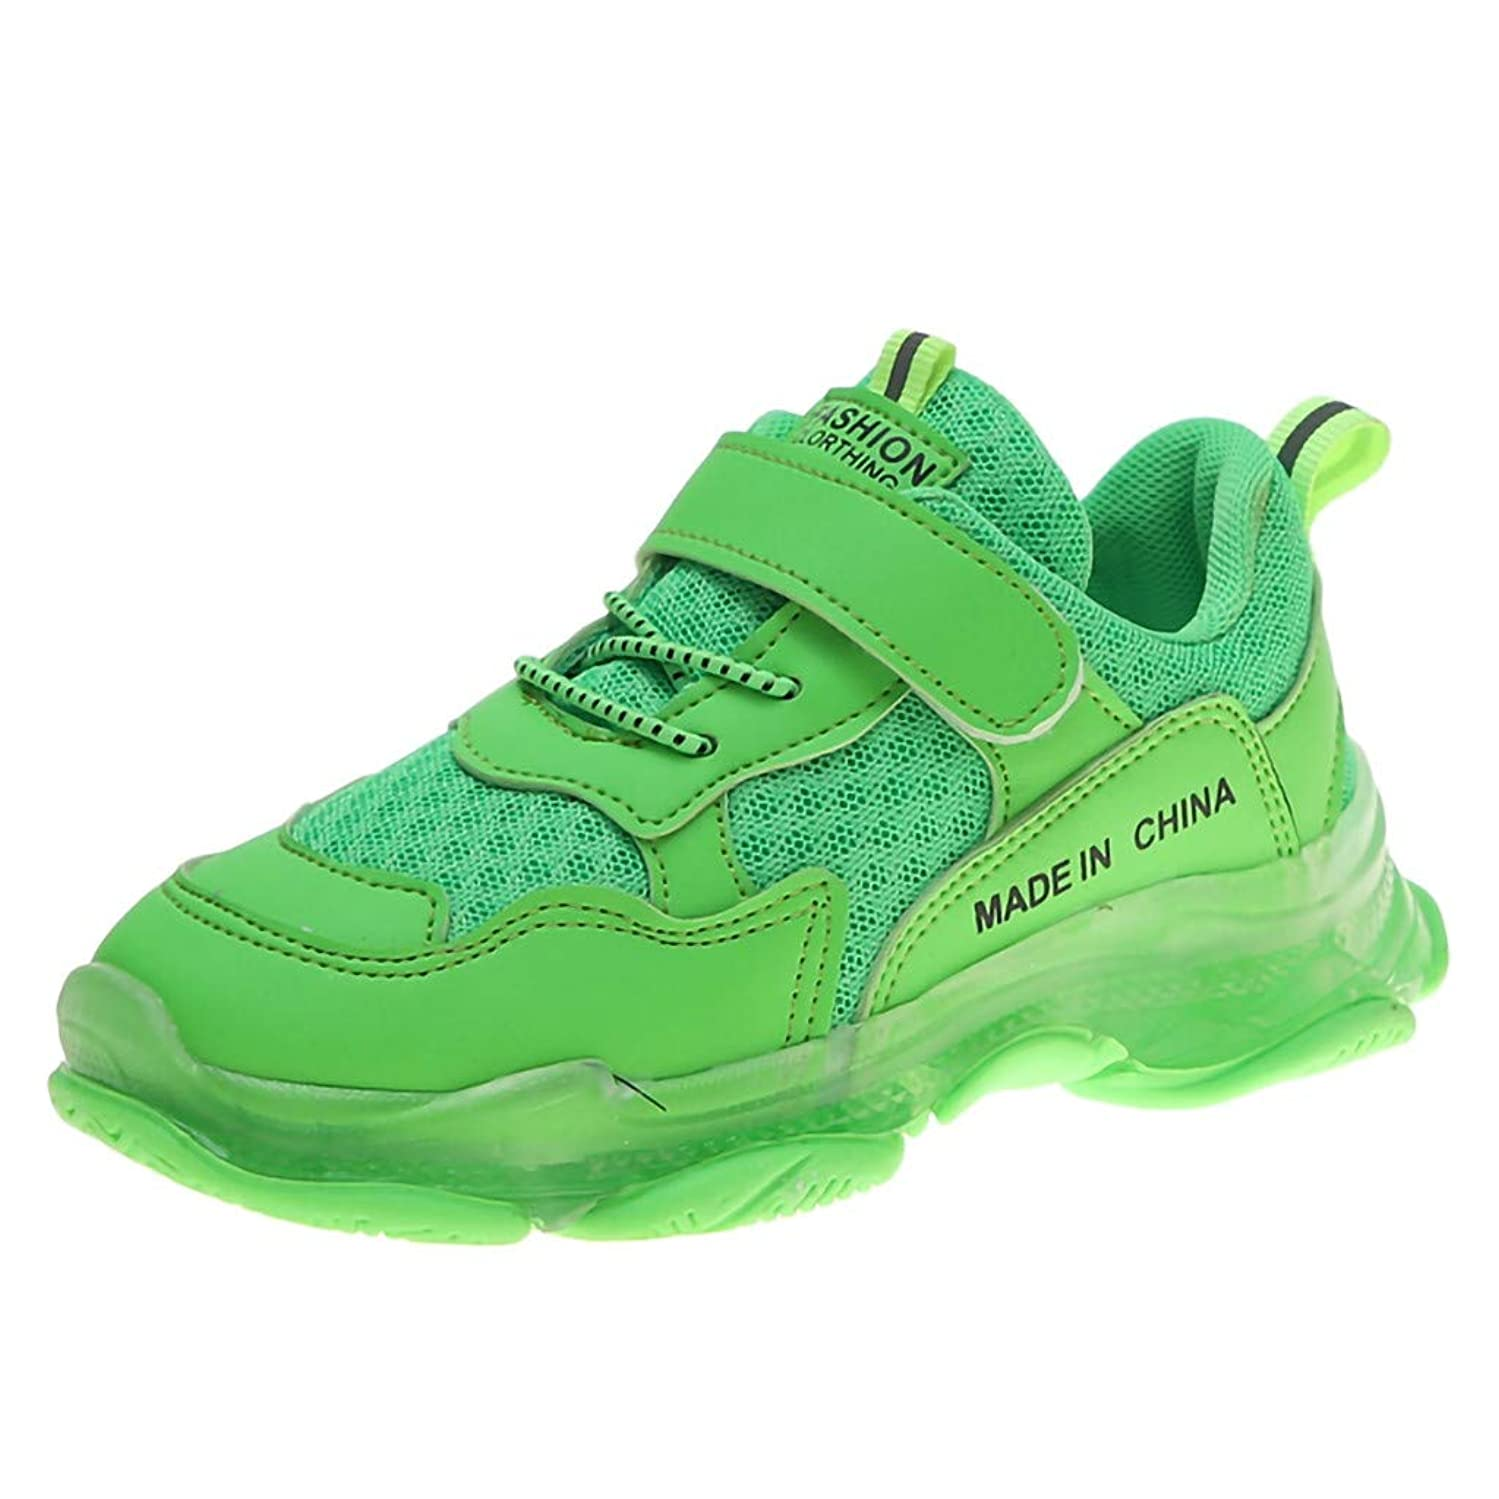 Boys Girls Sneakers,Londony?? Kids Breathable LED Light Up Flashing Sneakers for Children Shoes(Toddler/Little Kid/Kids)